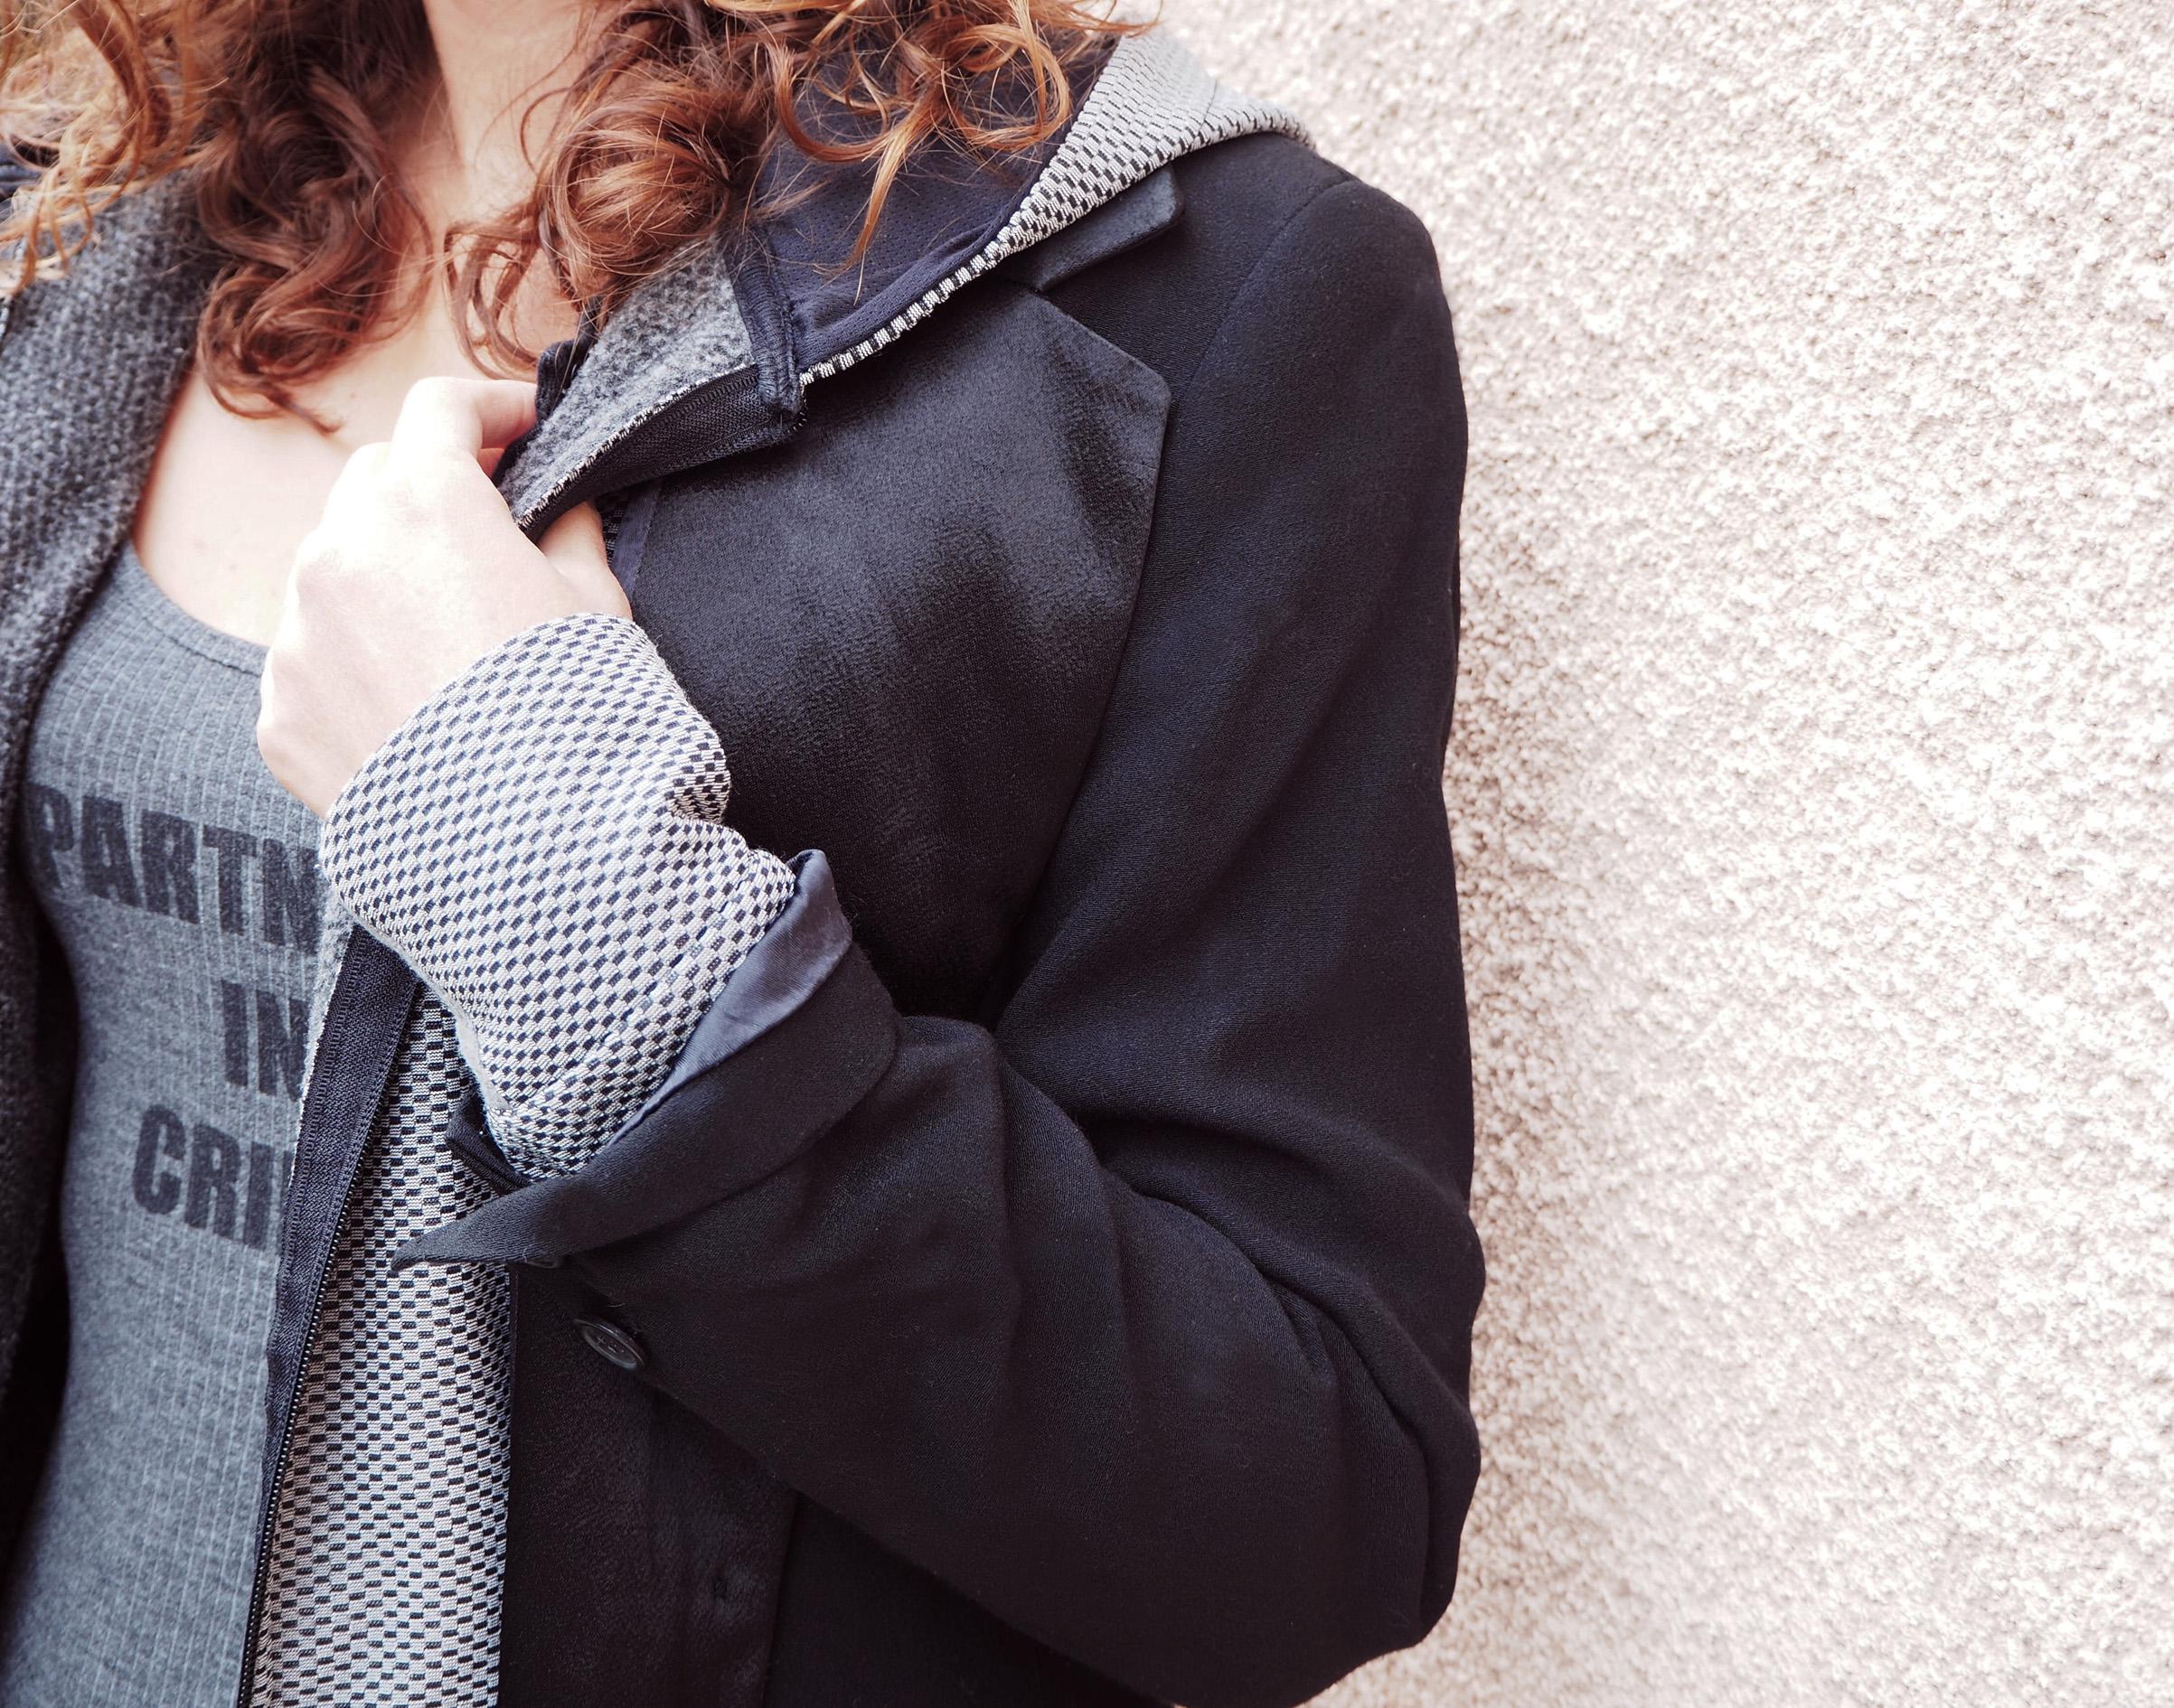 body undid partner in crime veste costard costume sport sportswear gris grey noir black satin coton